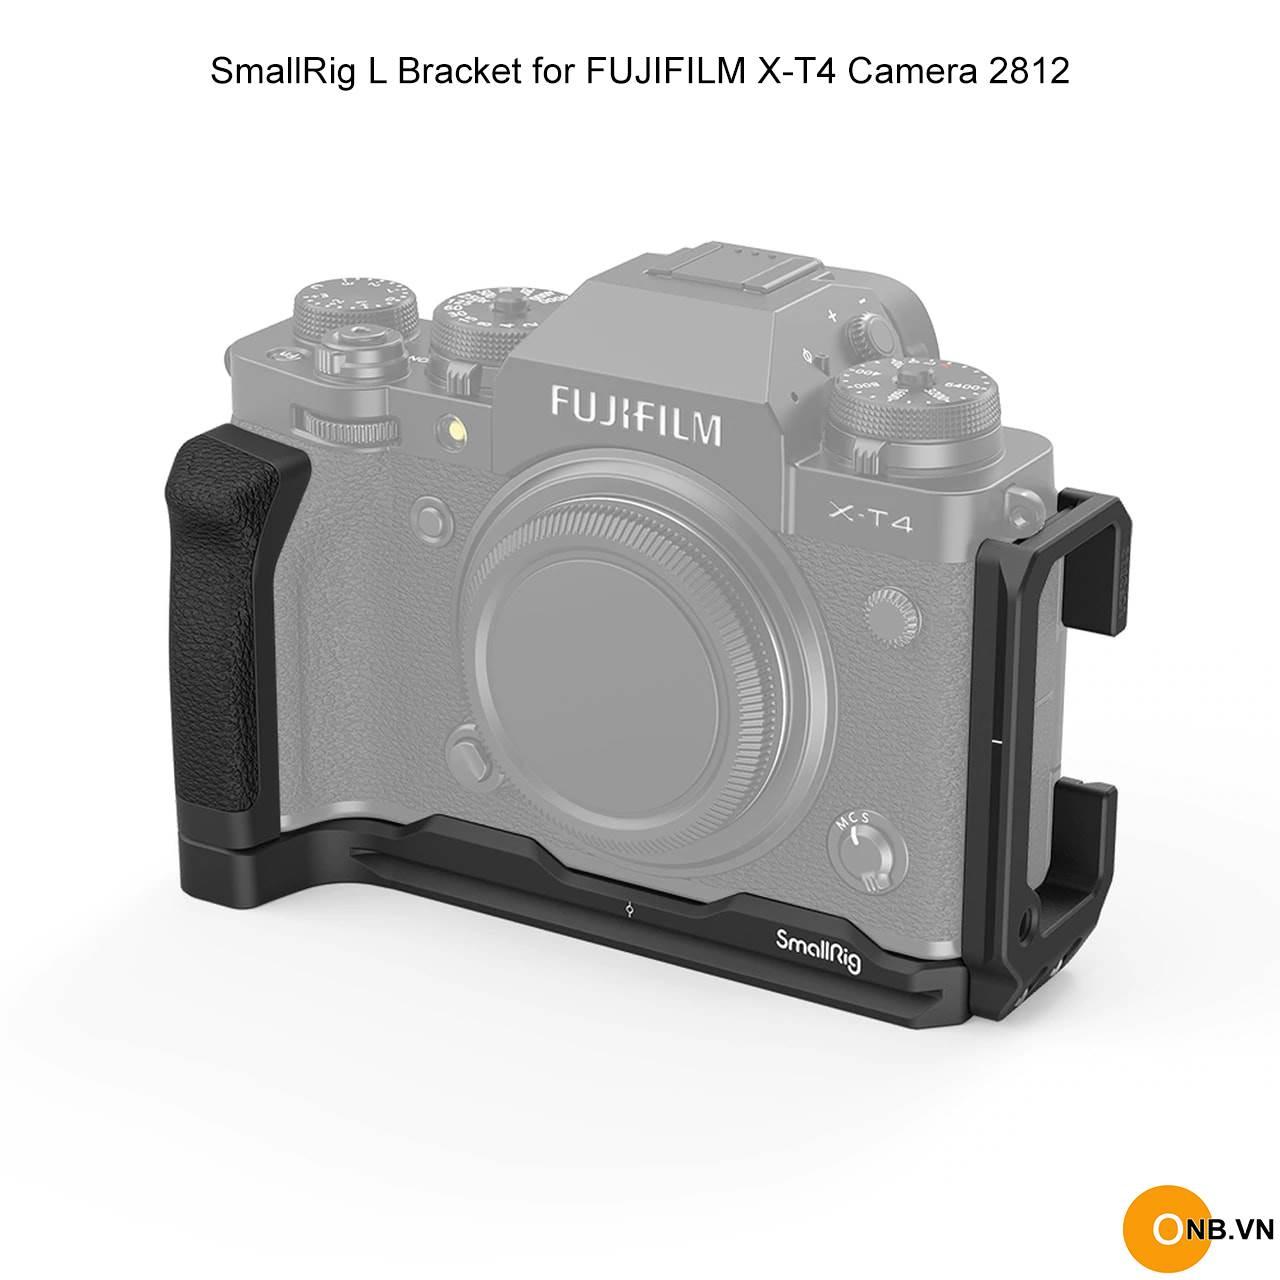 SmallRig L Bracket for FUJIFILM X-T4 Camera 2812